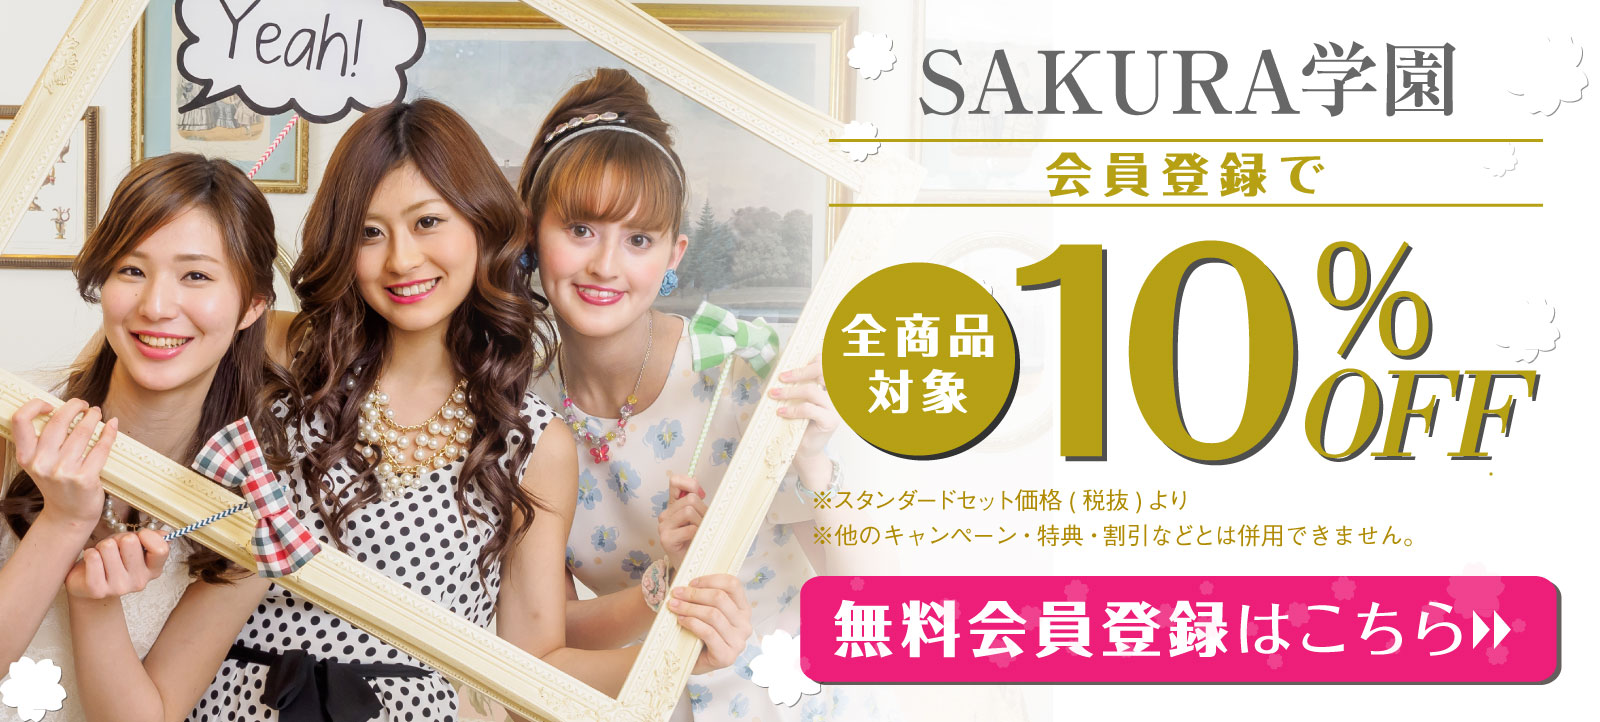 SAKURA学園 無料会員登録